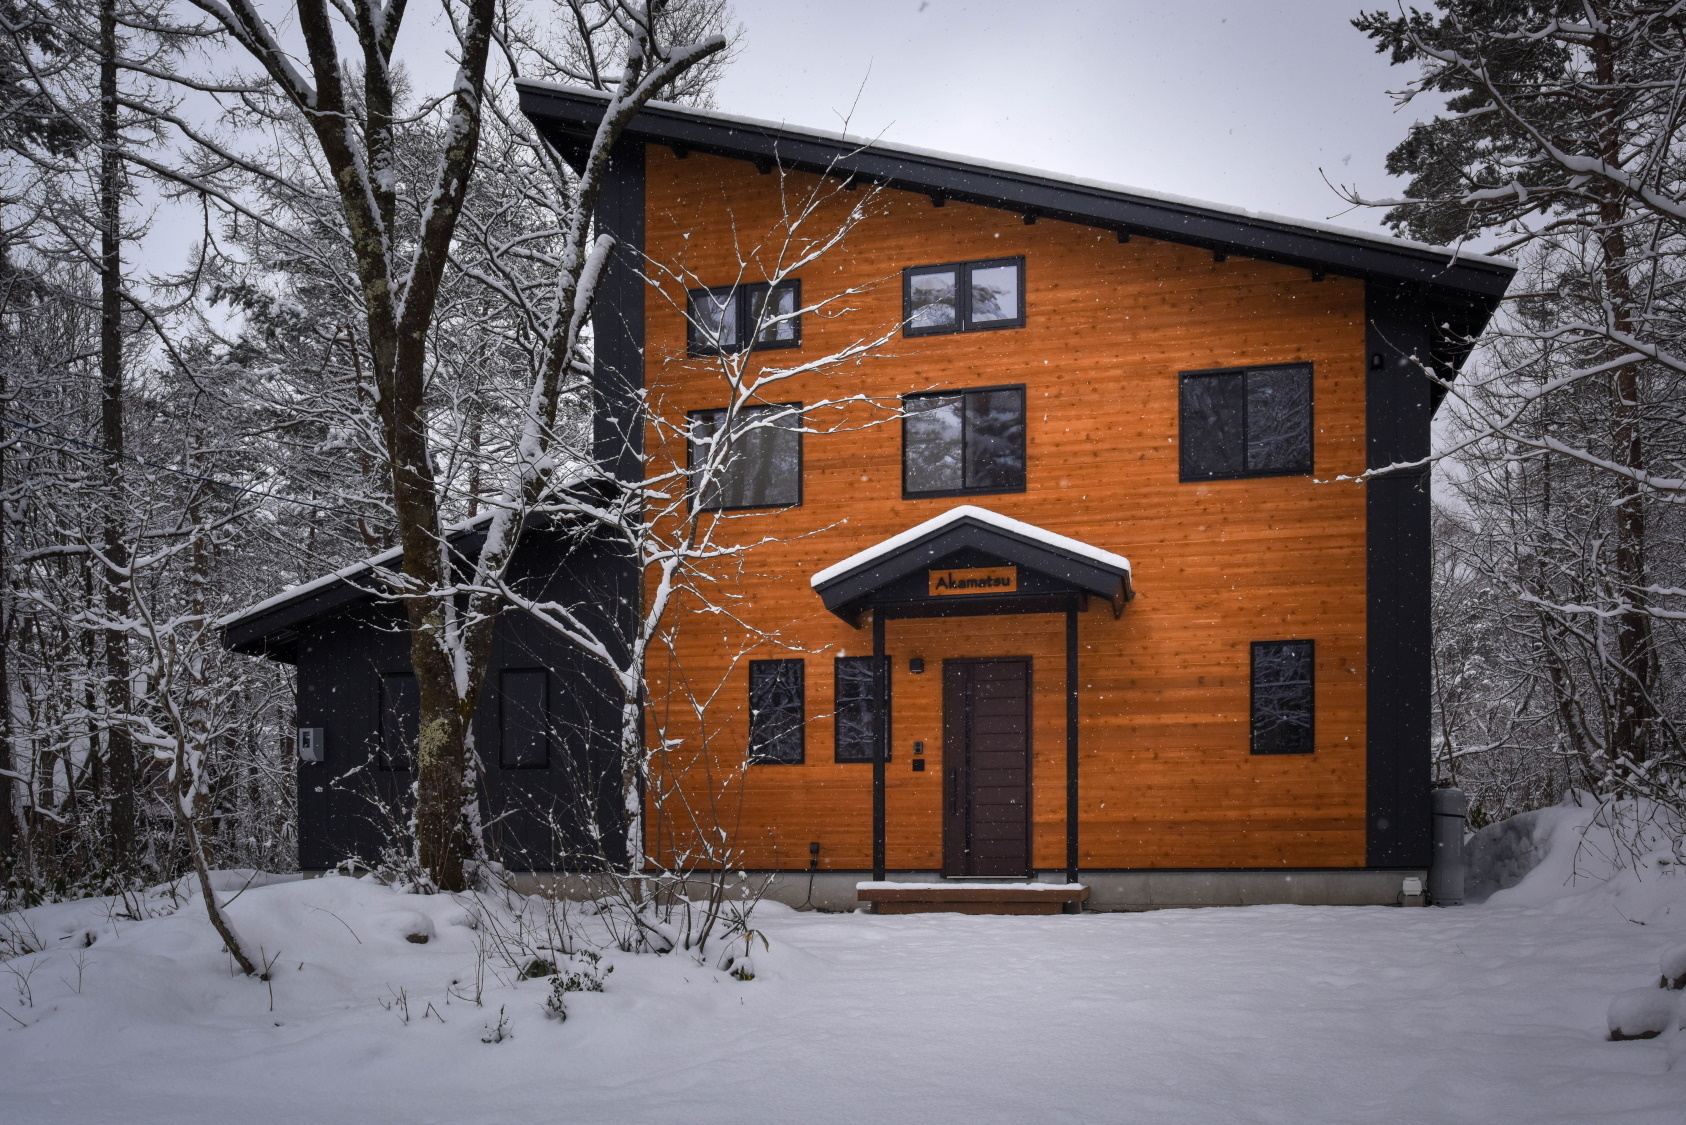 Akamatsu House